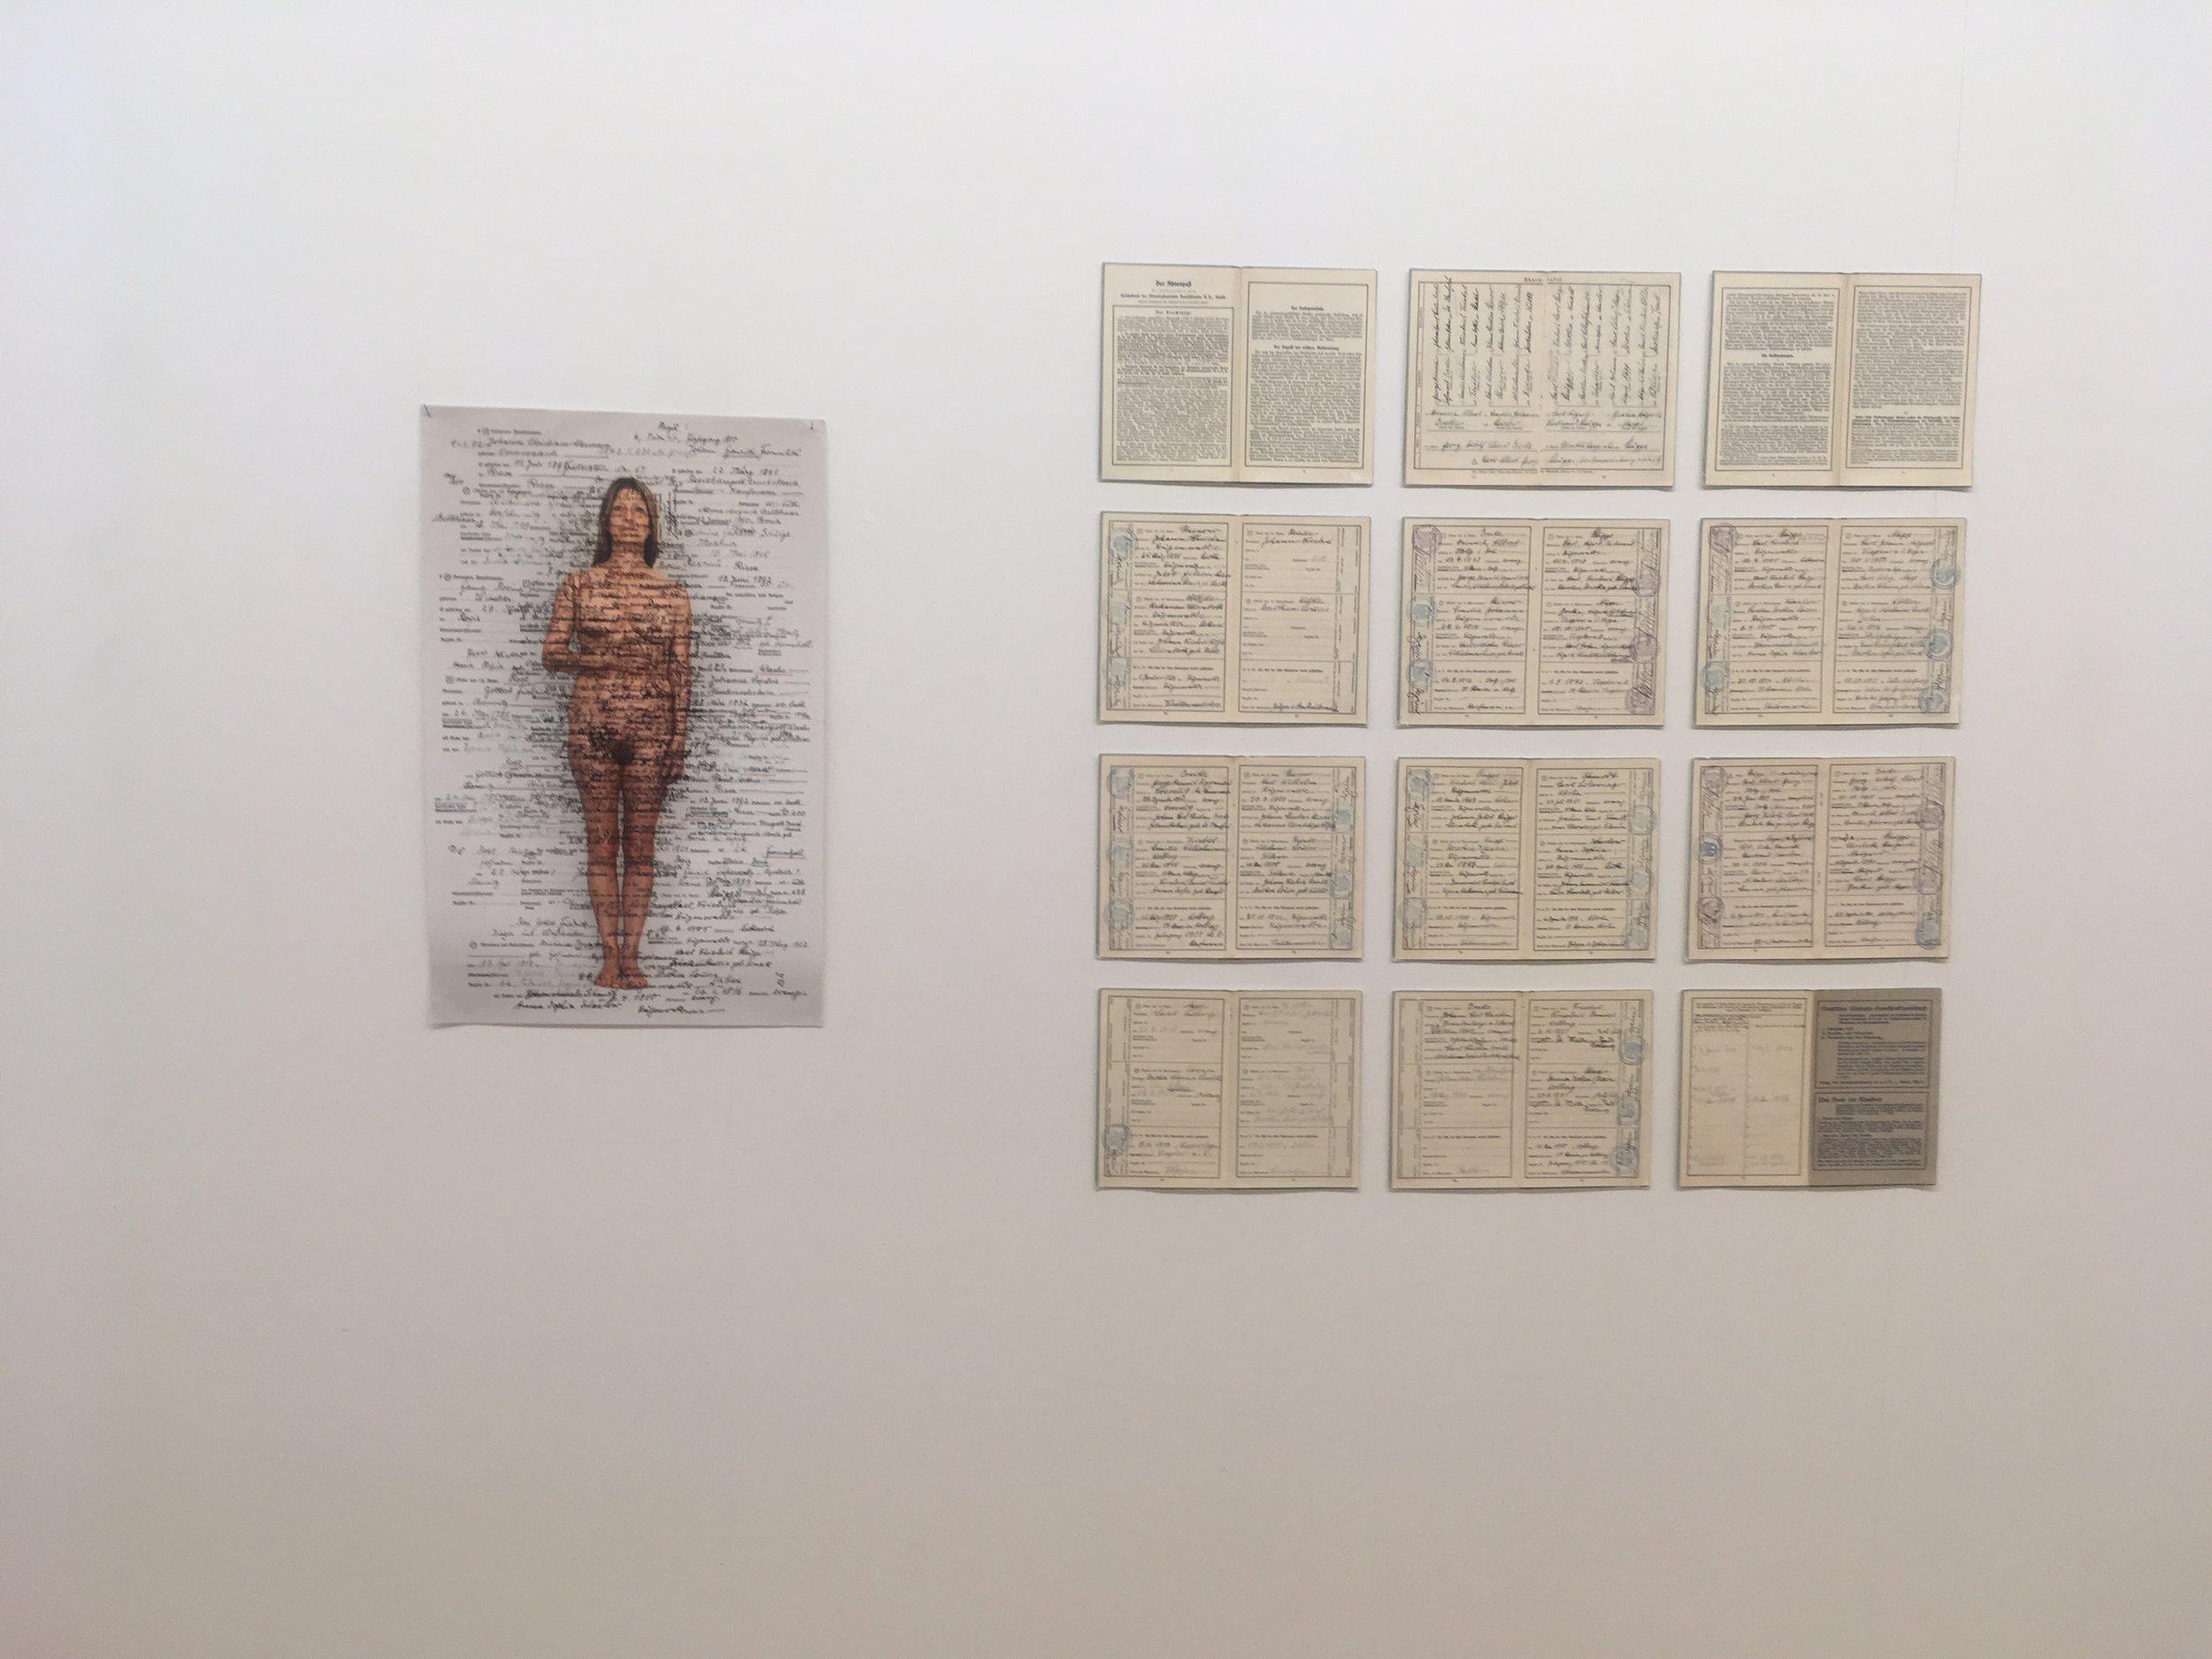 (17) Elisabeth Moritz Abecita konstmuseum.JPG